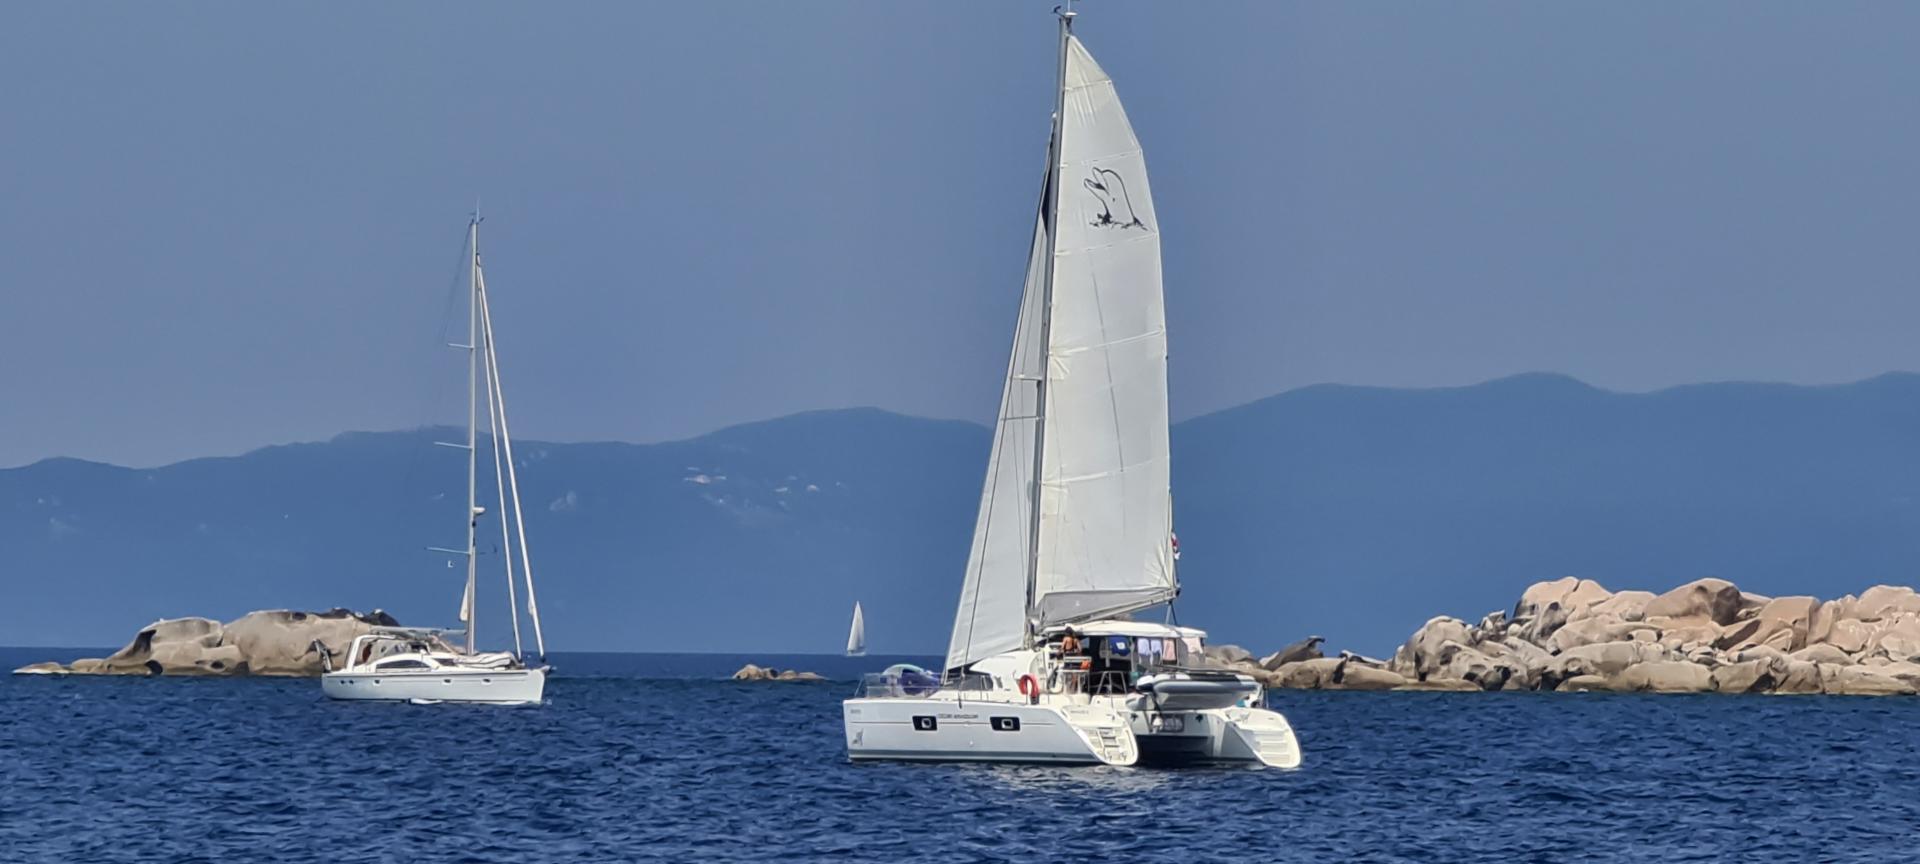 Lagoon 380 in corsica